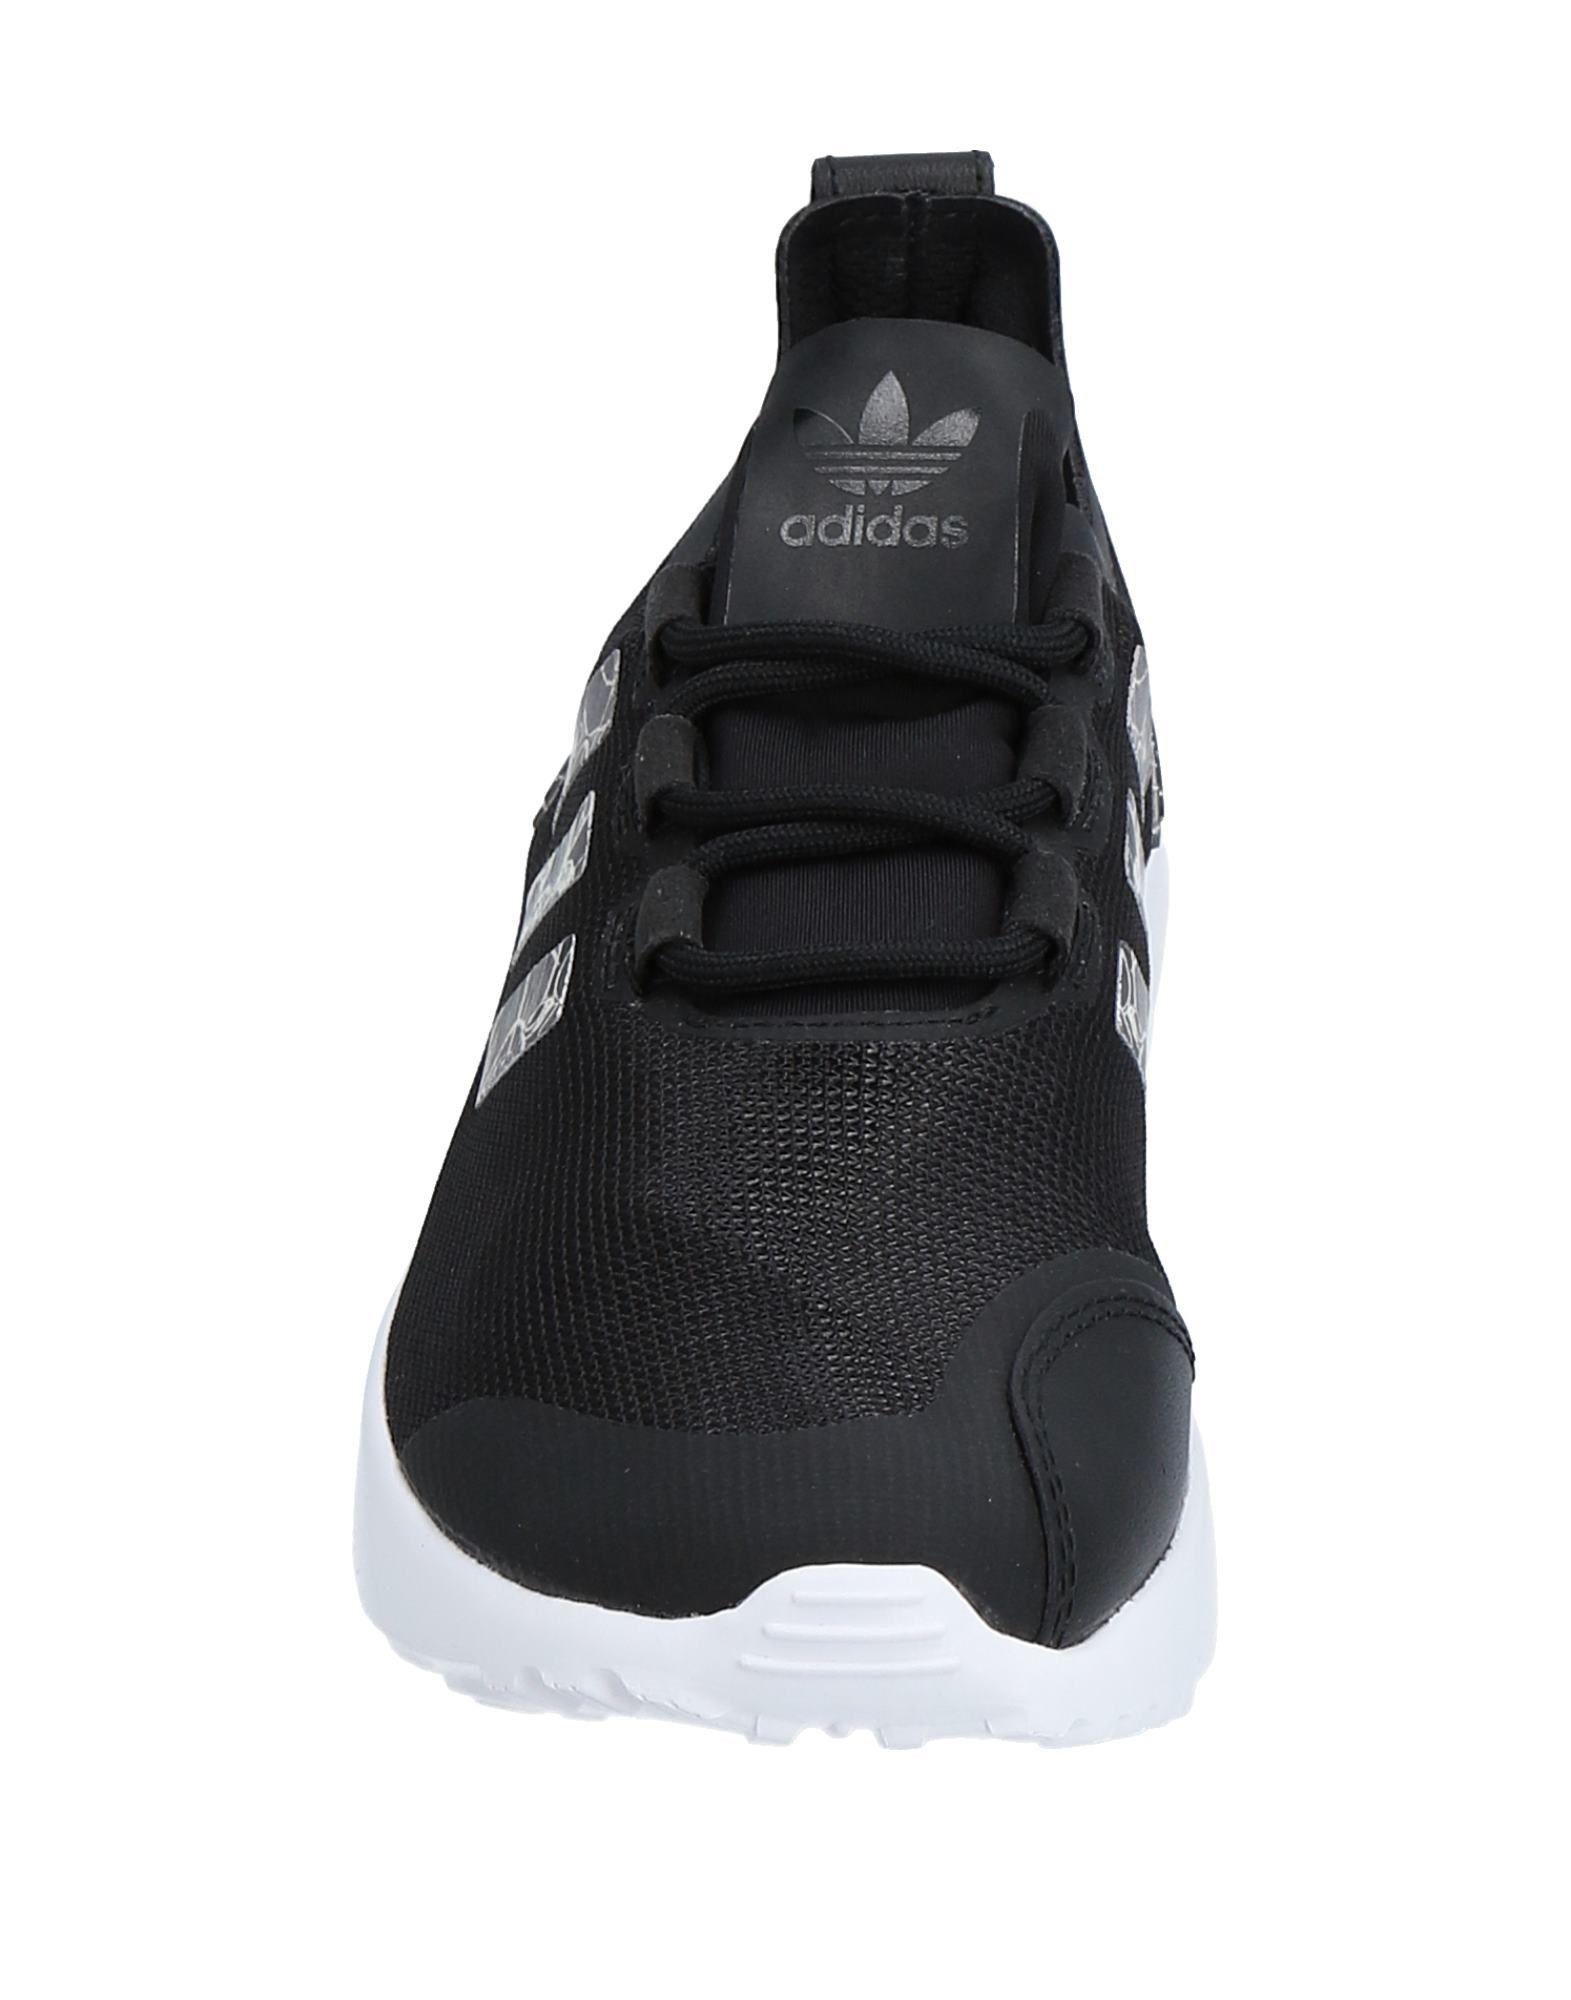 Adidas Originals Sneakers Damen 11531352VQ  11531352VQ Damen  fd6c6e